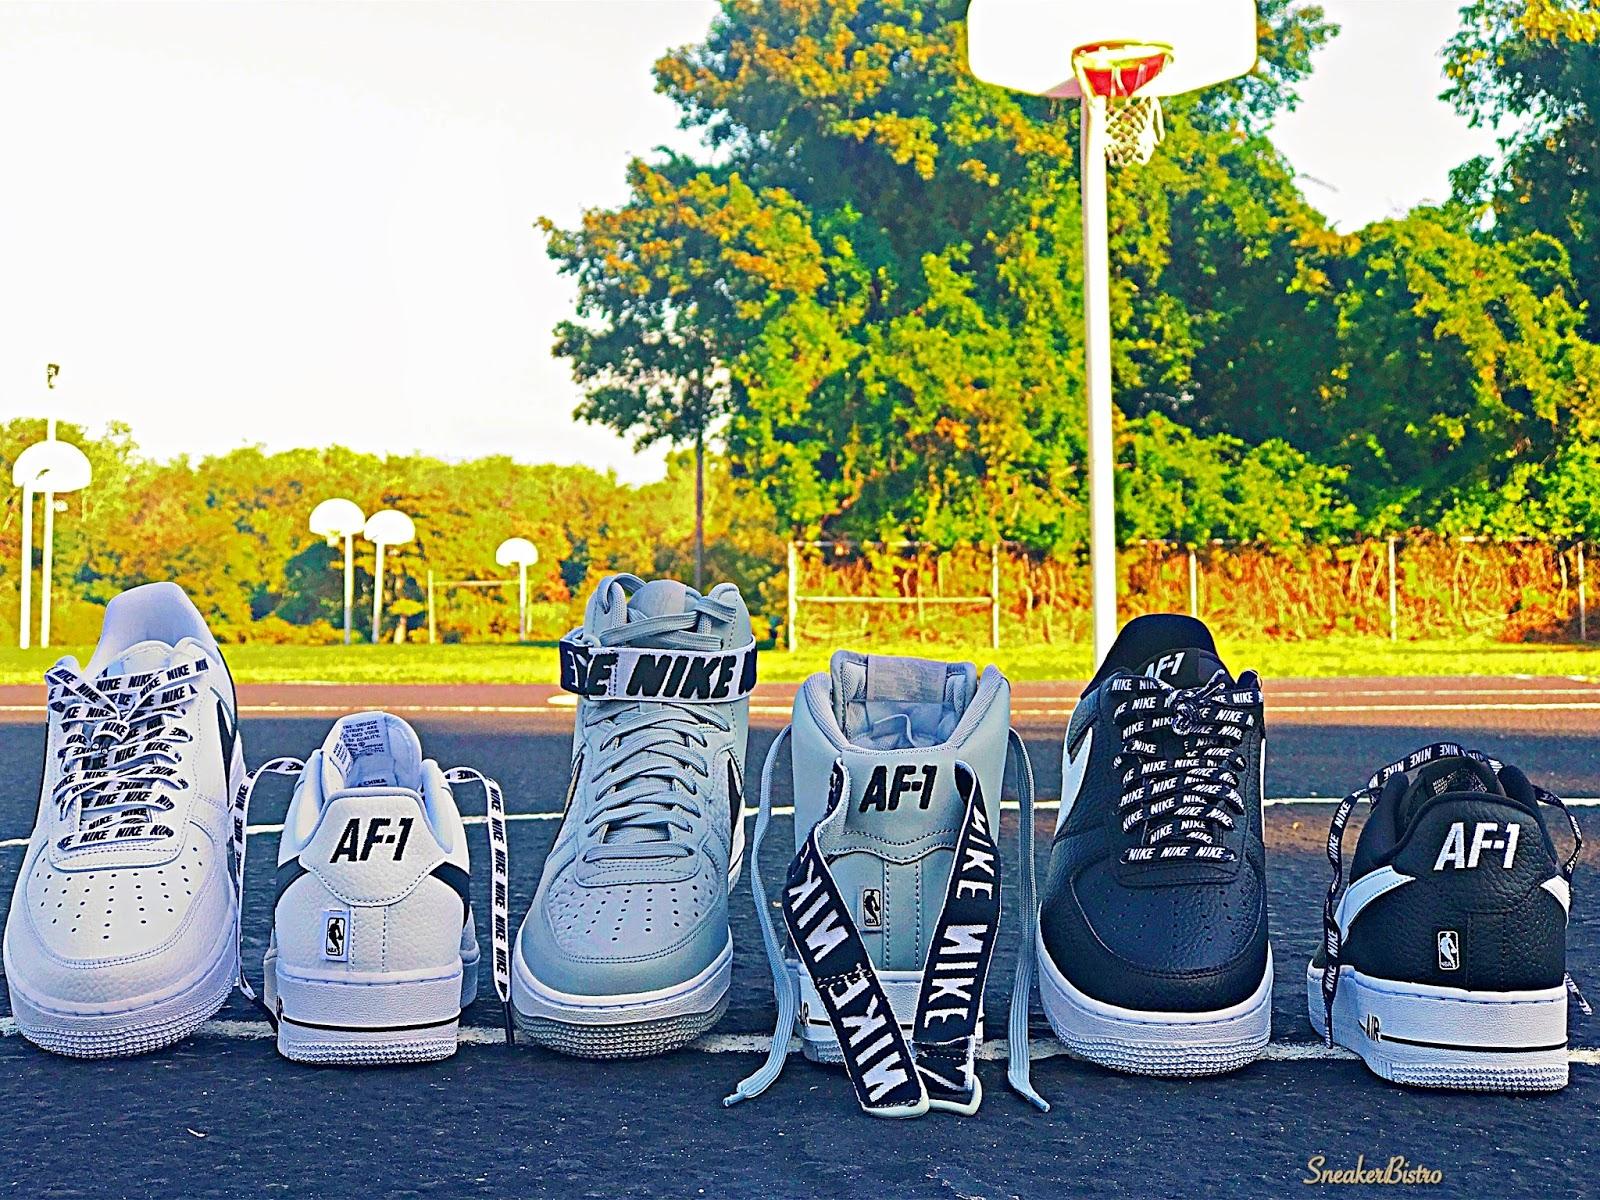 Sneaker Bistro Streetwear Served W Class Nike Air Force